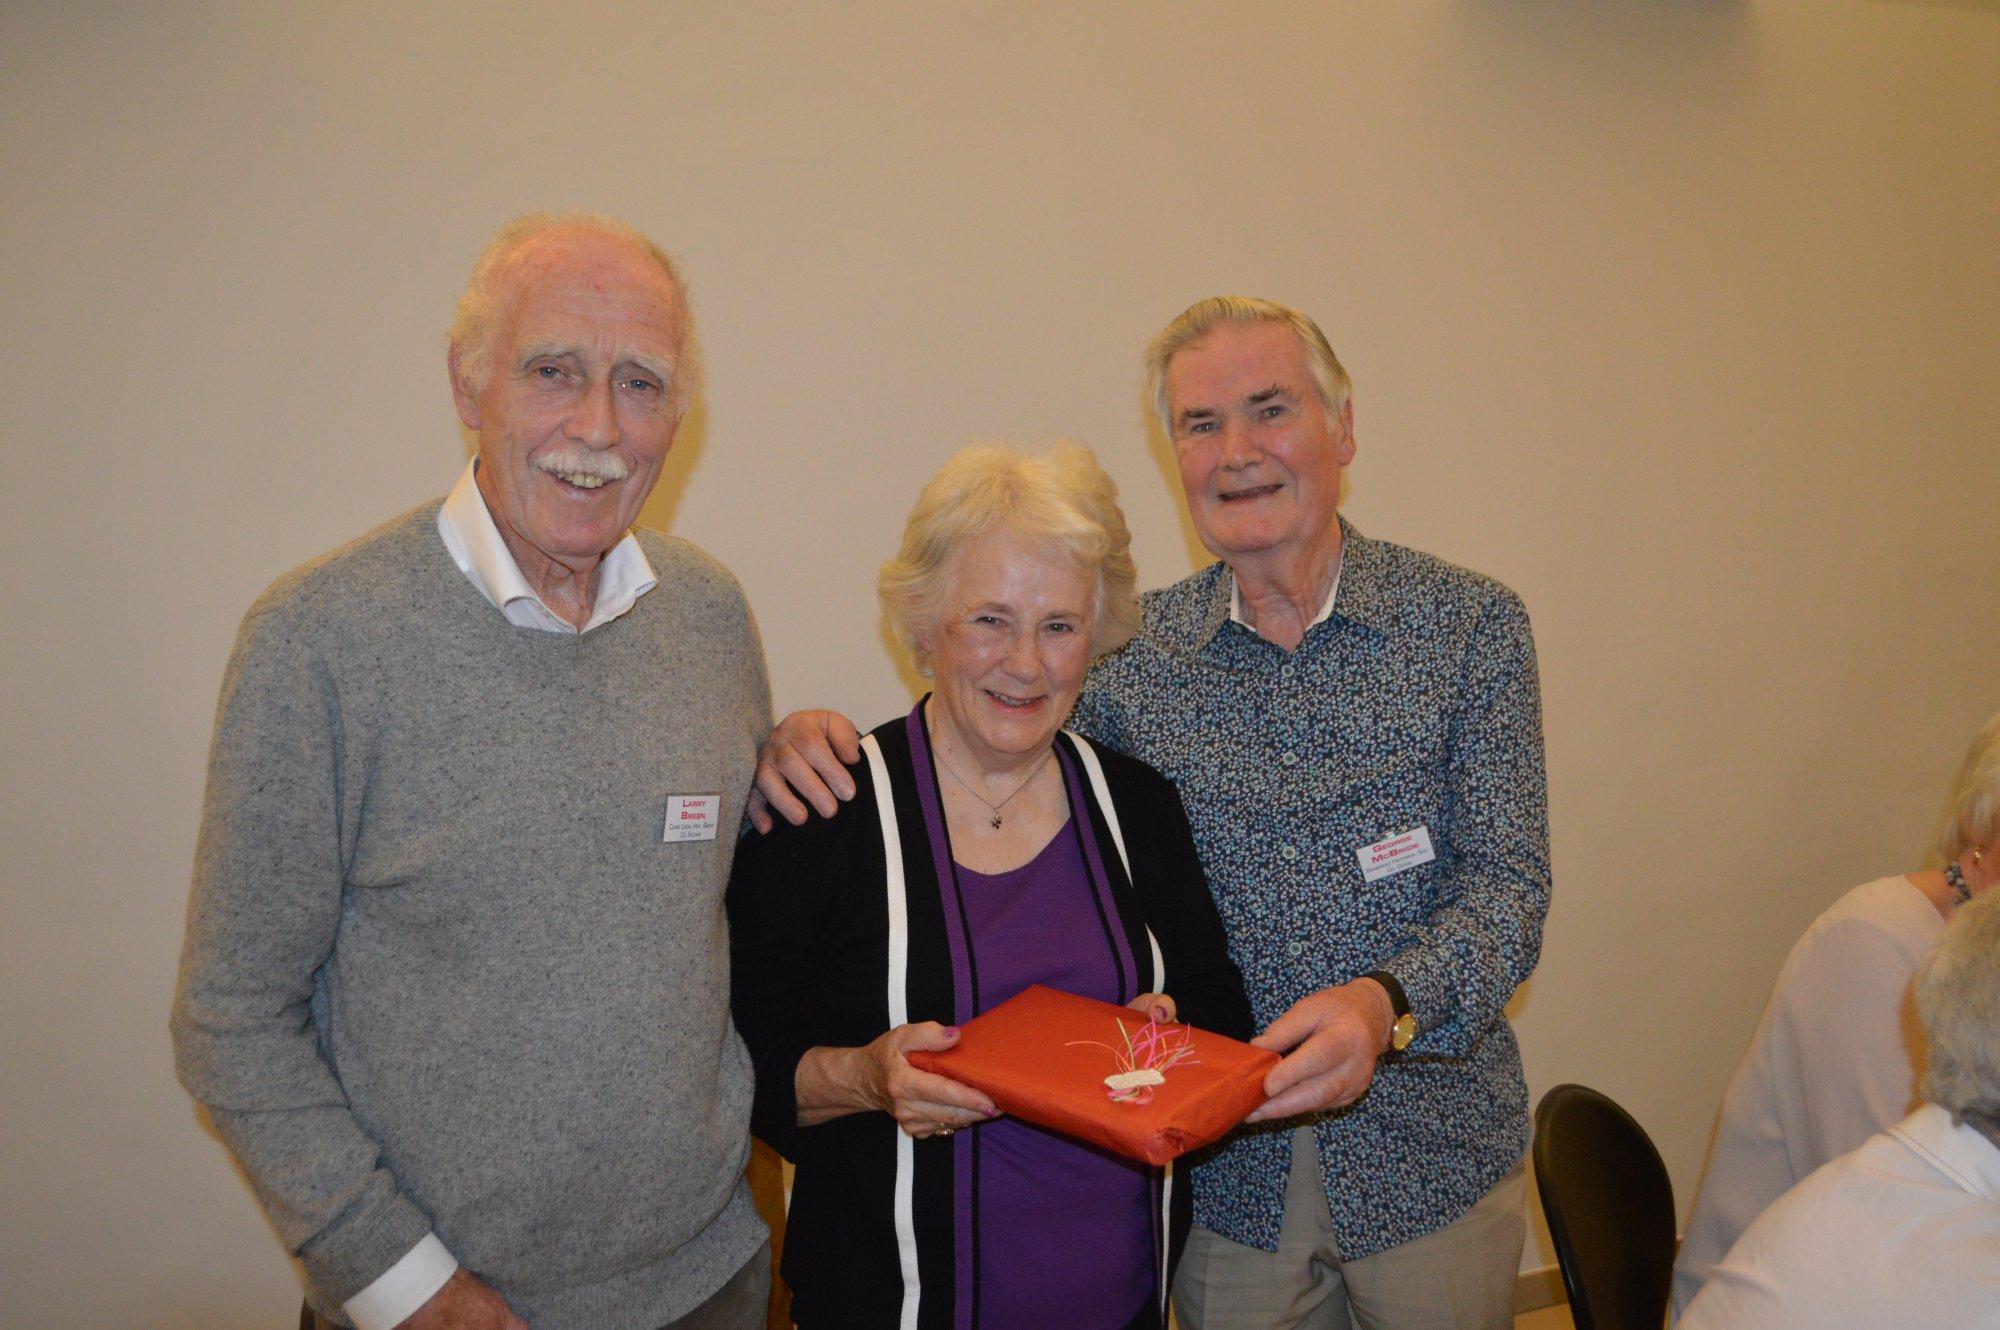 Doreen & George 57th Anniversary